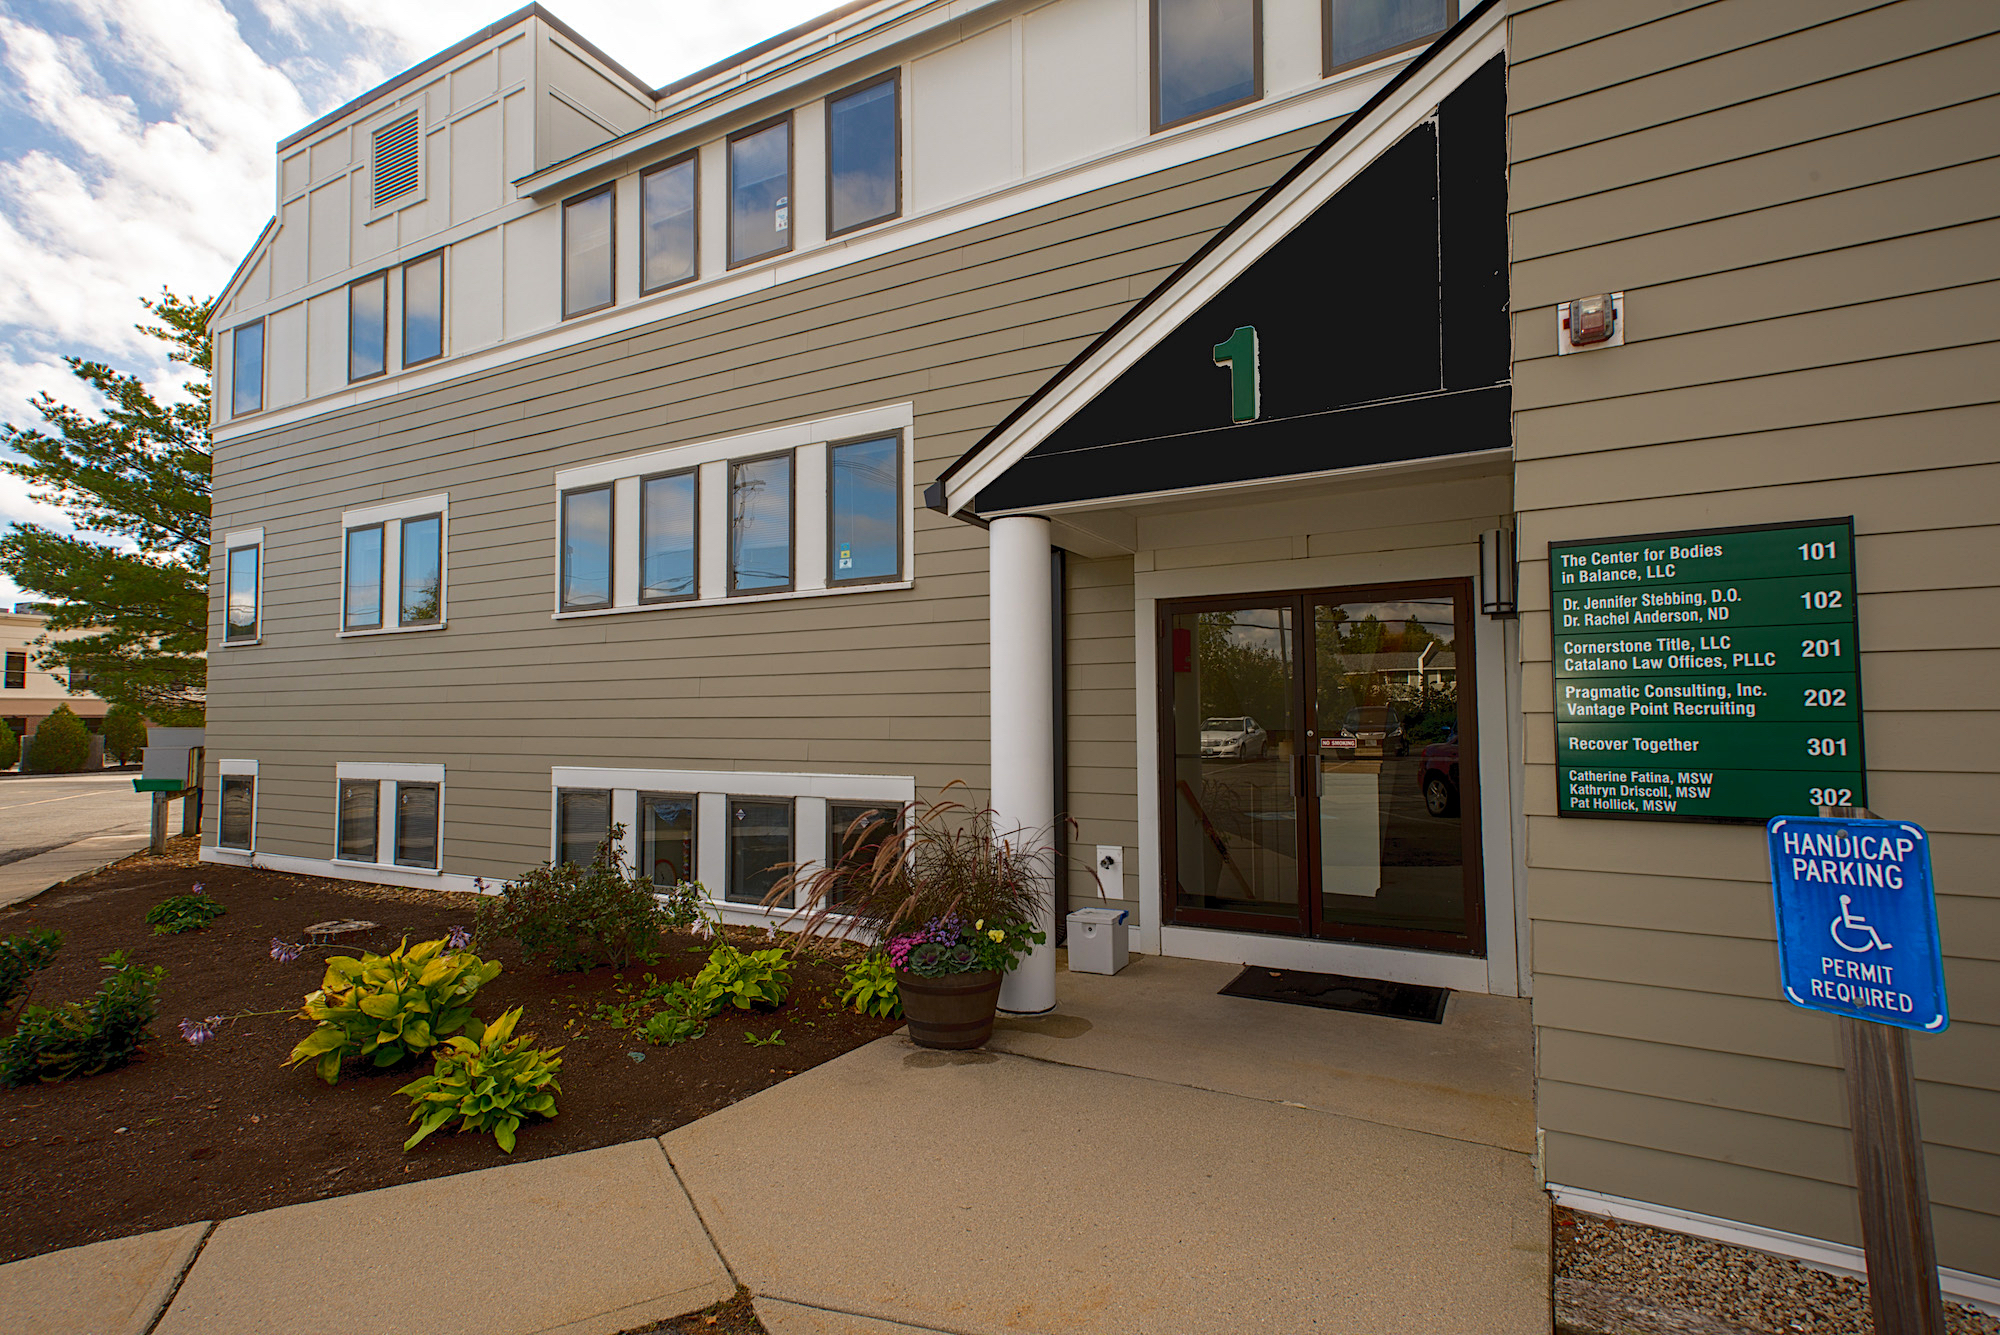 _KWB7752 - B._B front building   copy.jpg